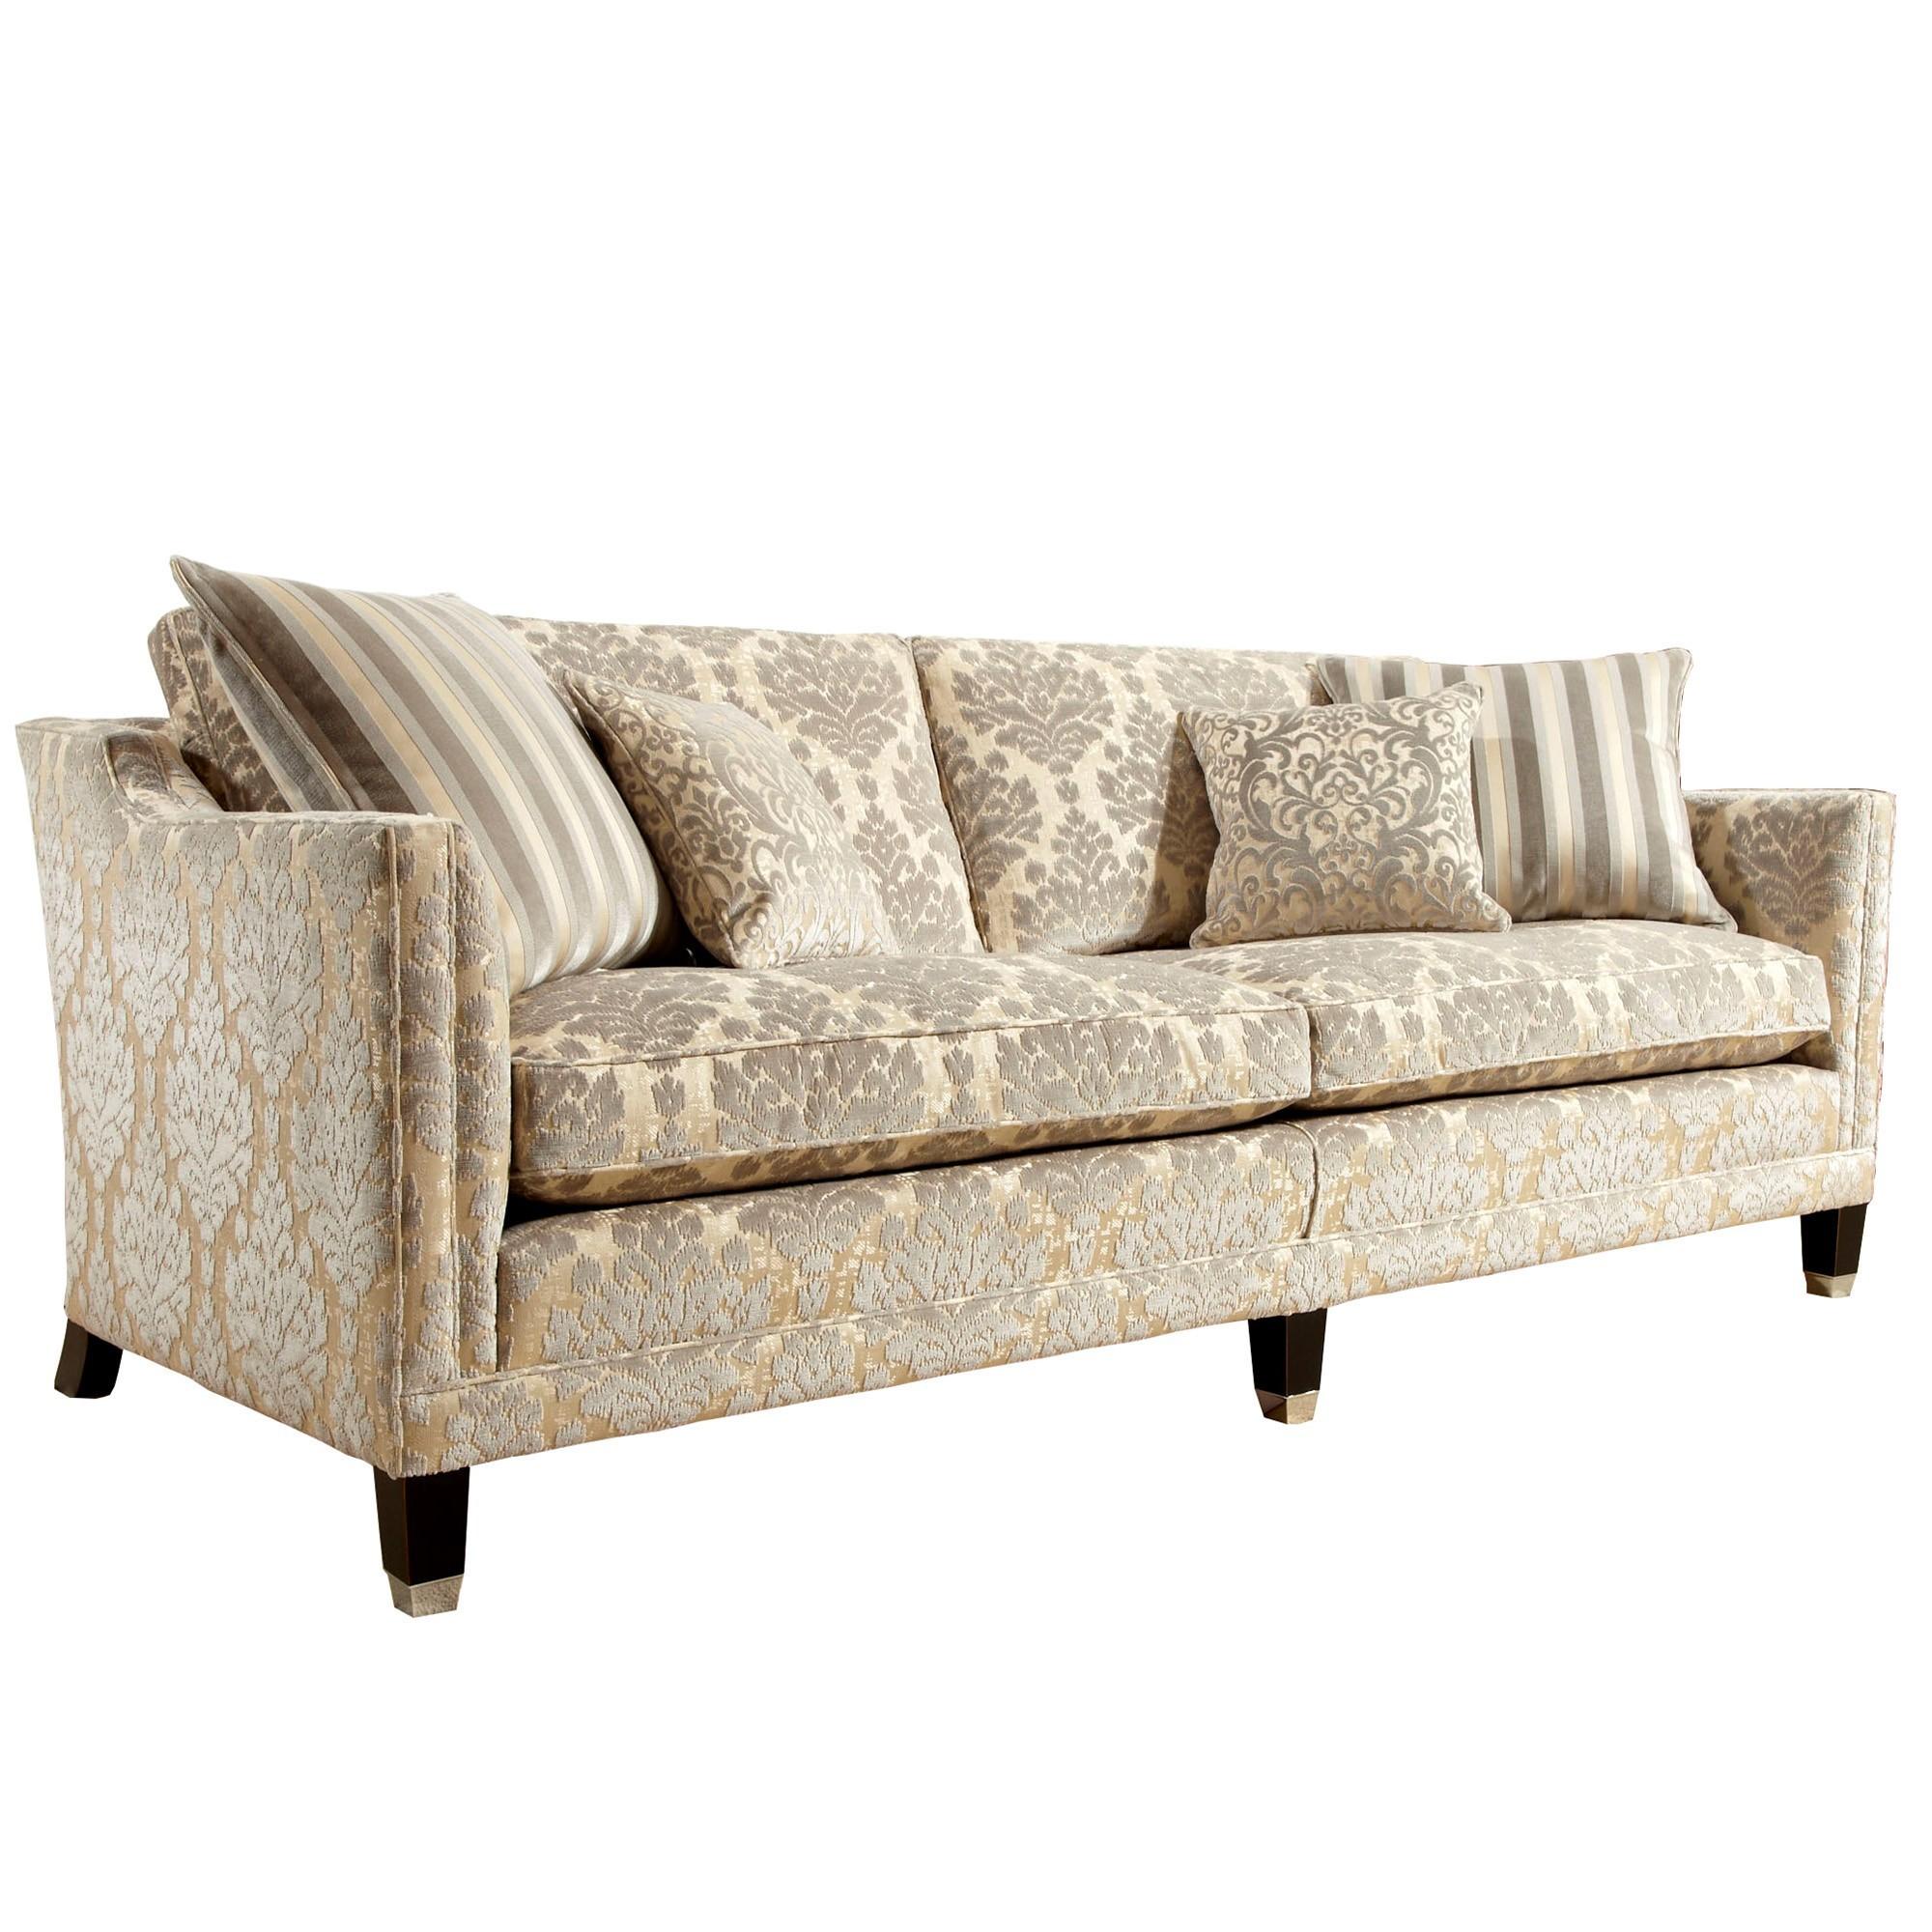 Duresta Collingwood 3 Seater Sofa